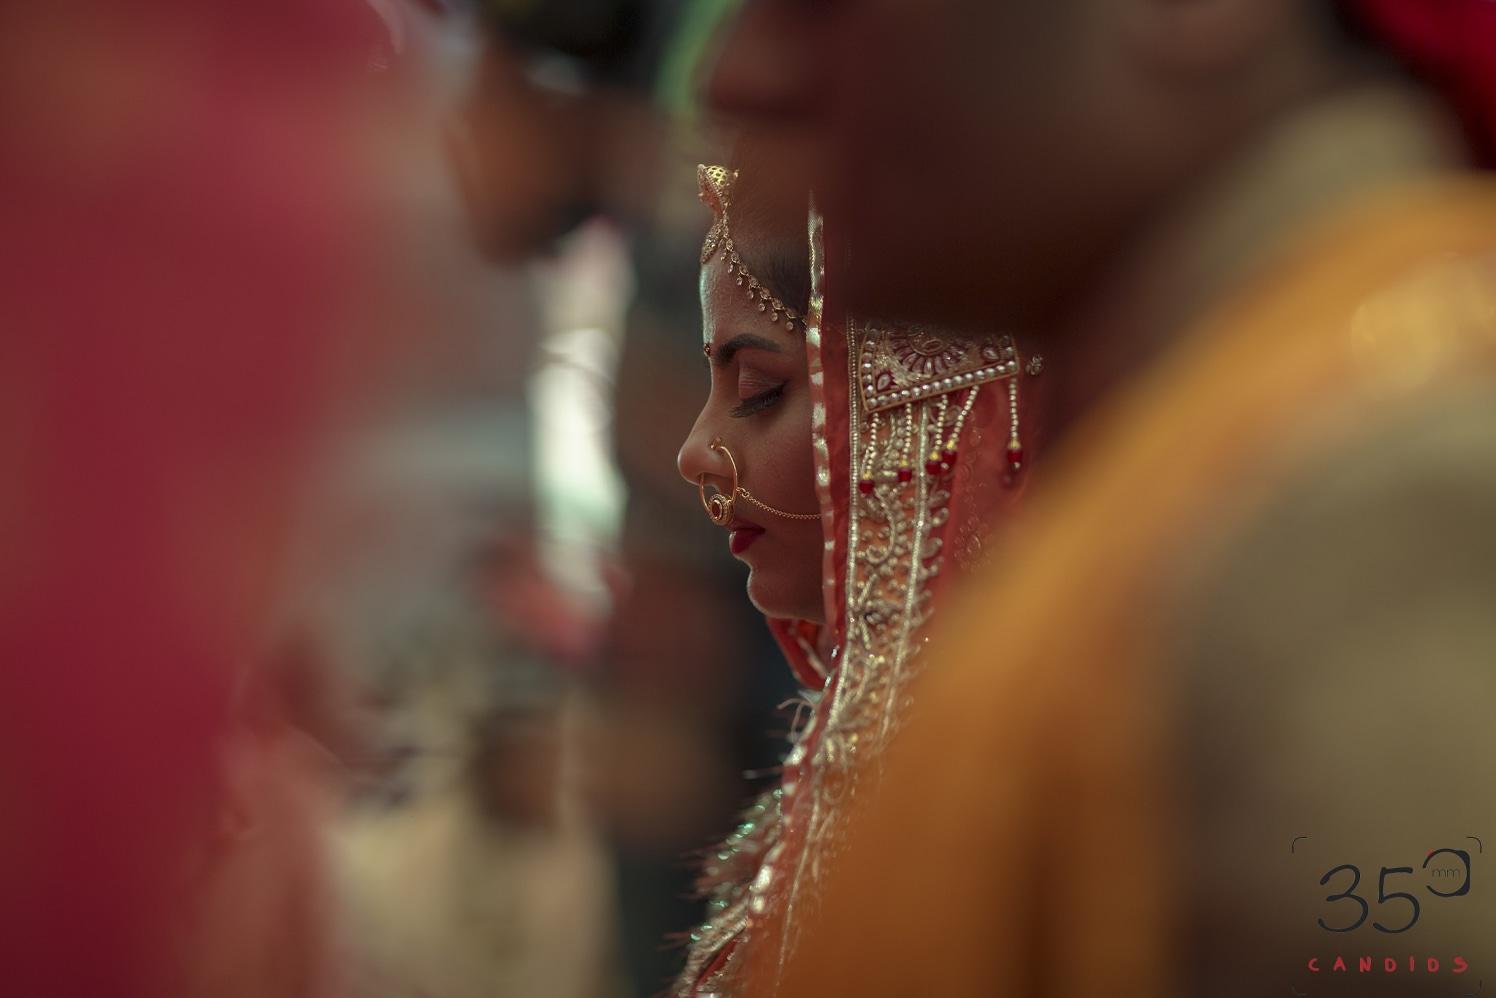 Bride In a Candid Moment During Her Wedding by Sagar Thackar Wedding-photography | Weddings Photos & Ideas